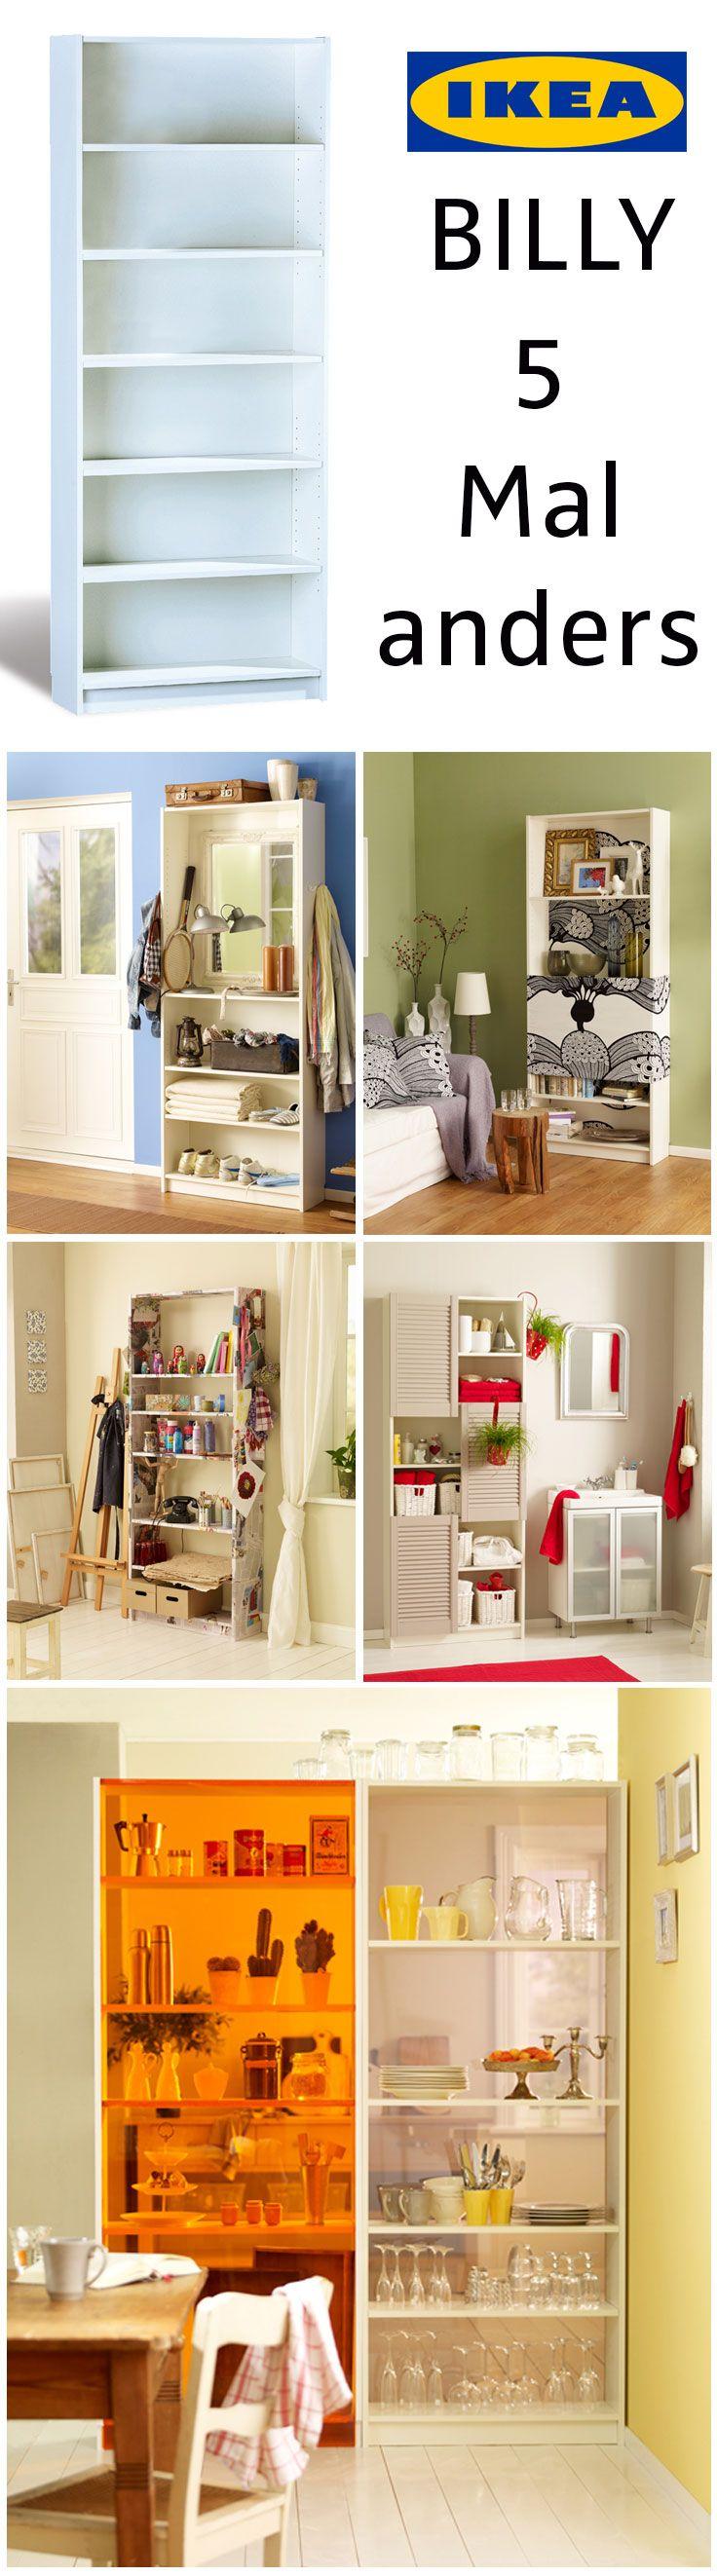 25+ best ideas about ikea möbel pimpen on pinterest | pimpen diy ... - Wohnideen Ikea Mbel